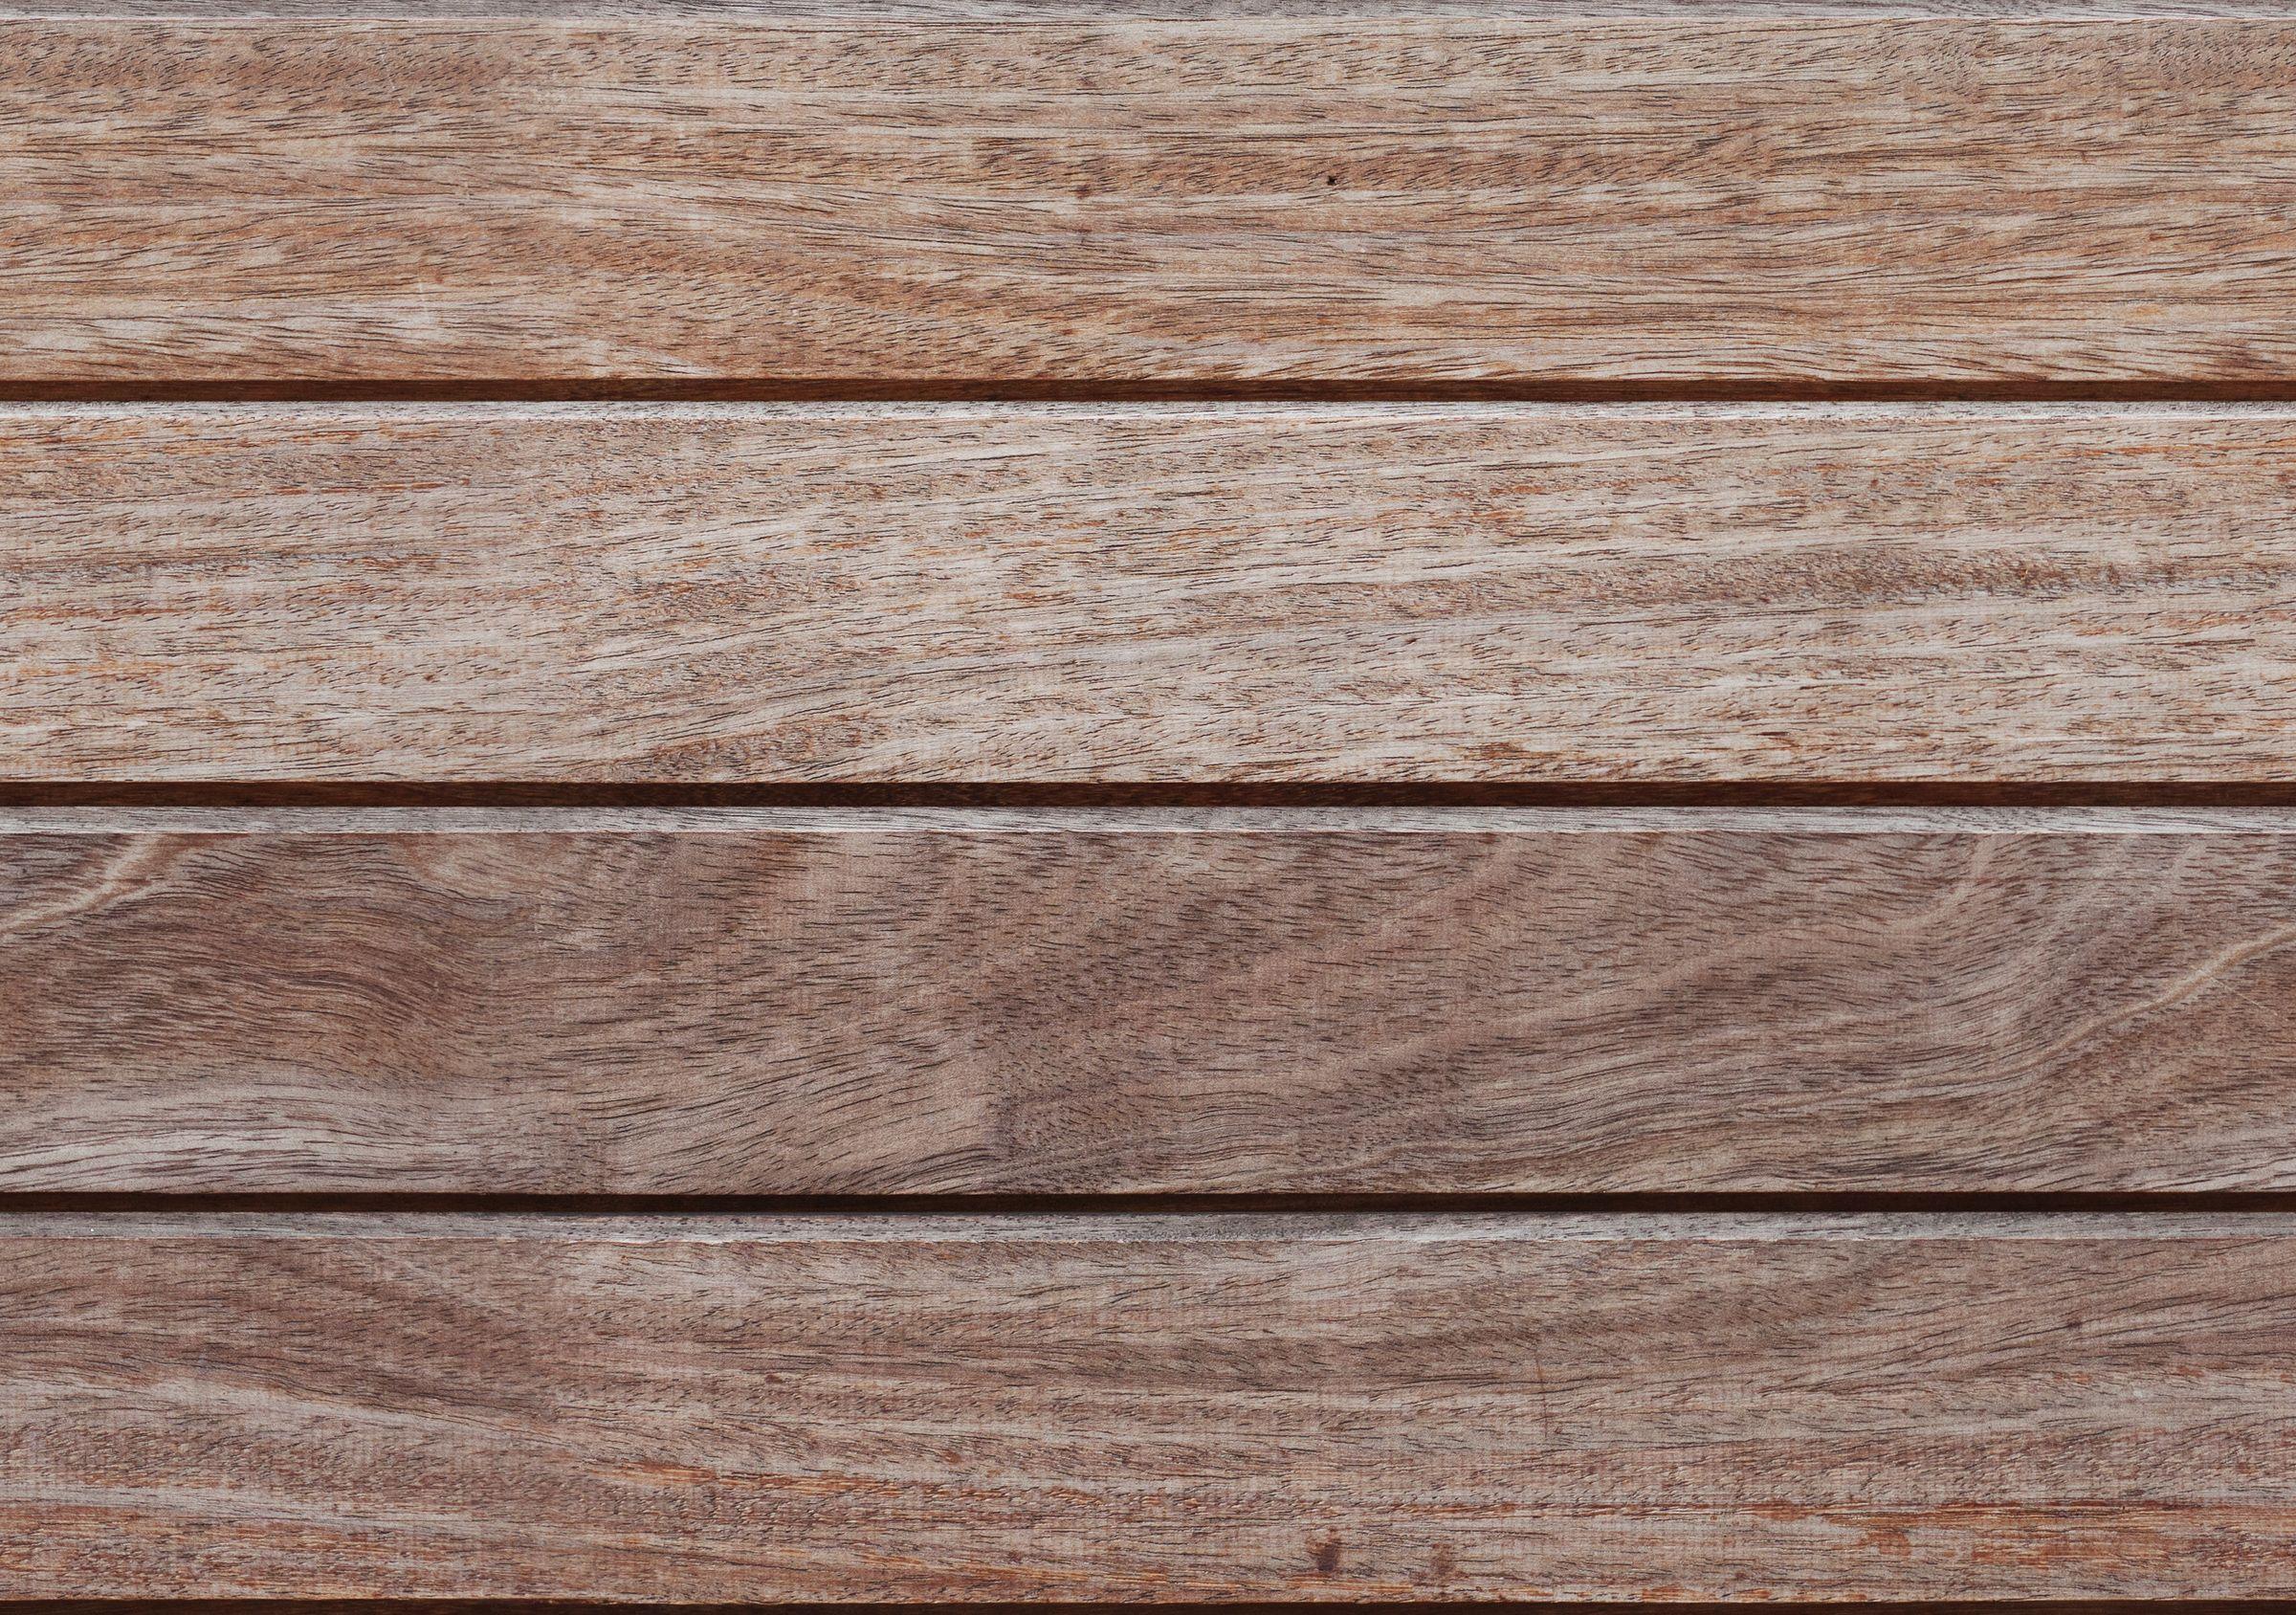 Wood texture wooden plank - Seamless Wood Planks Texture